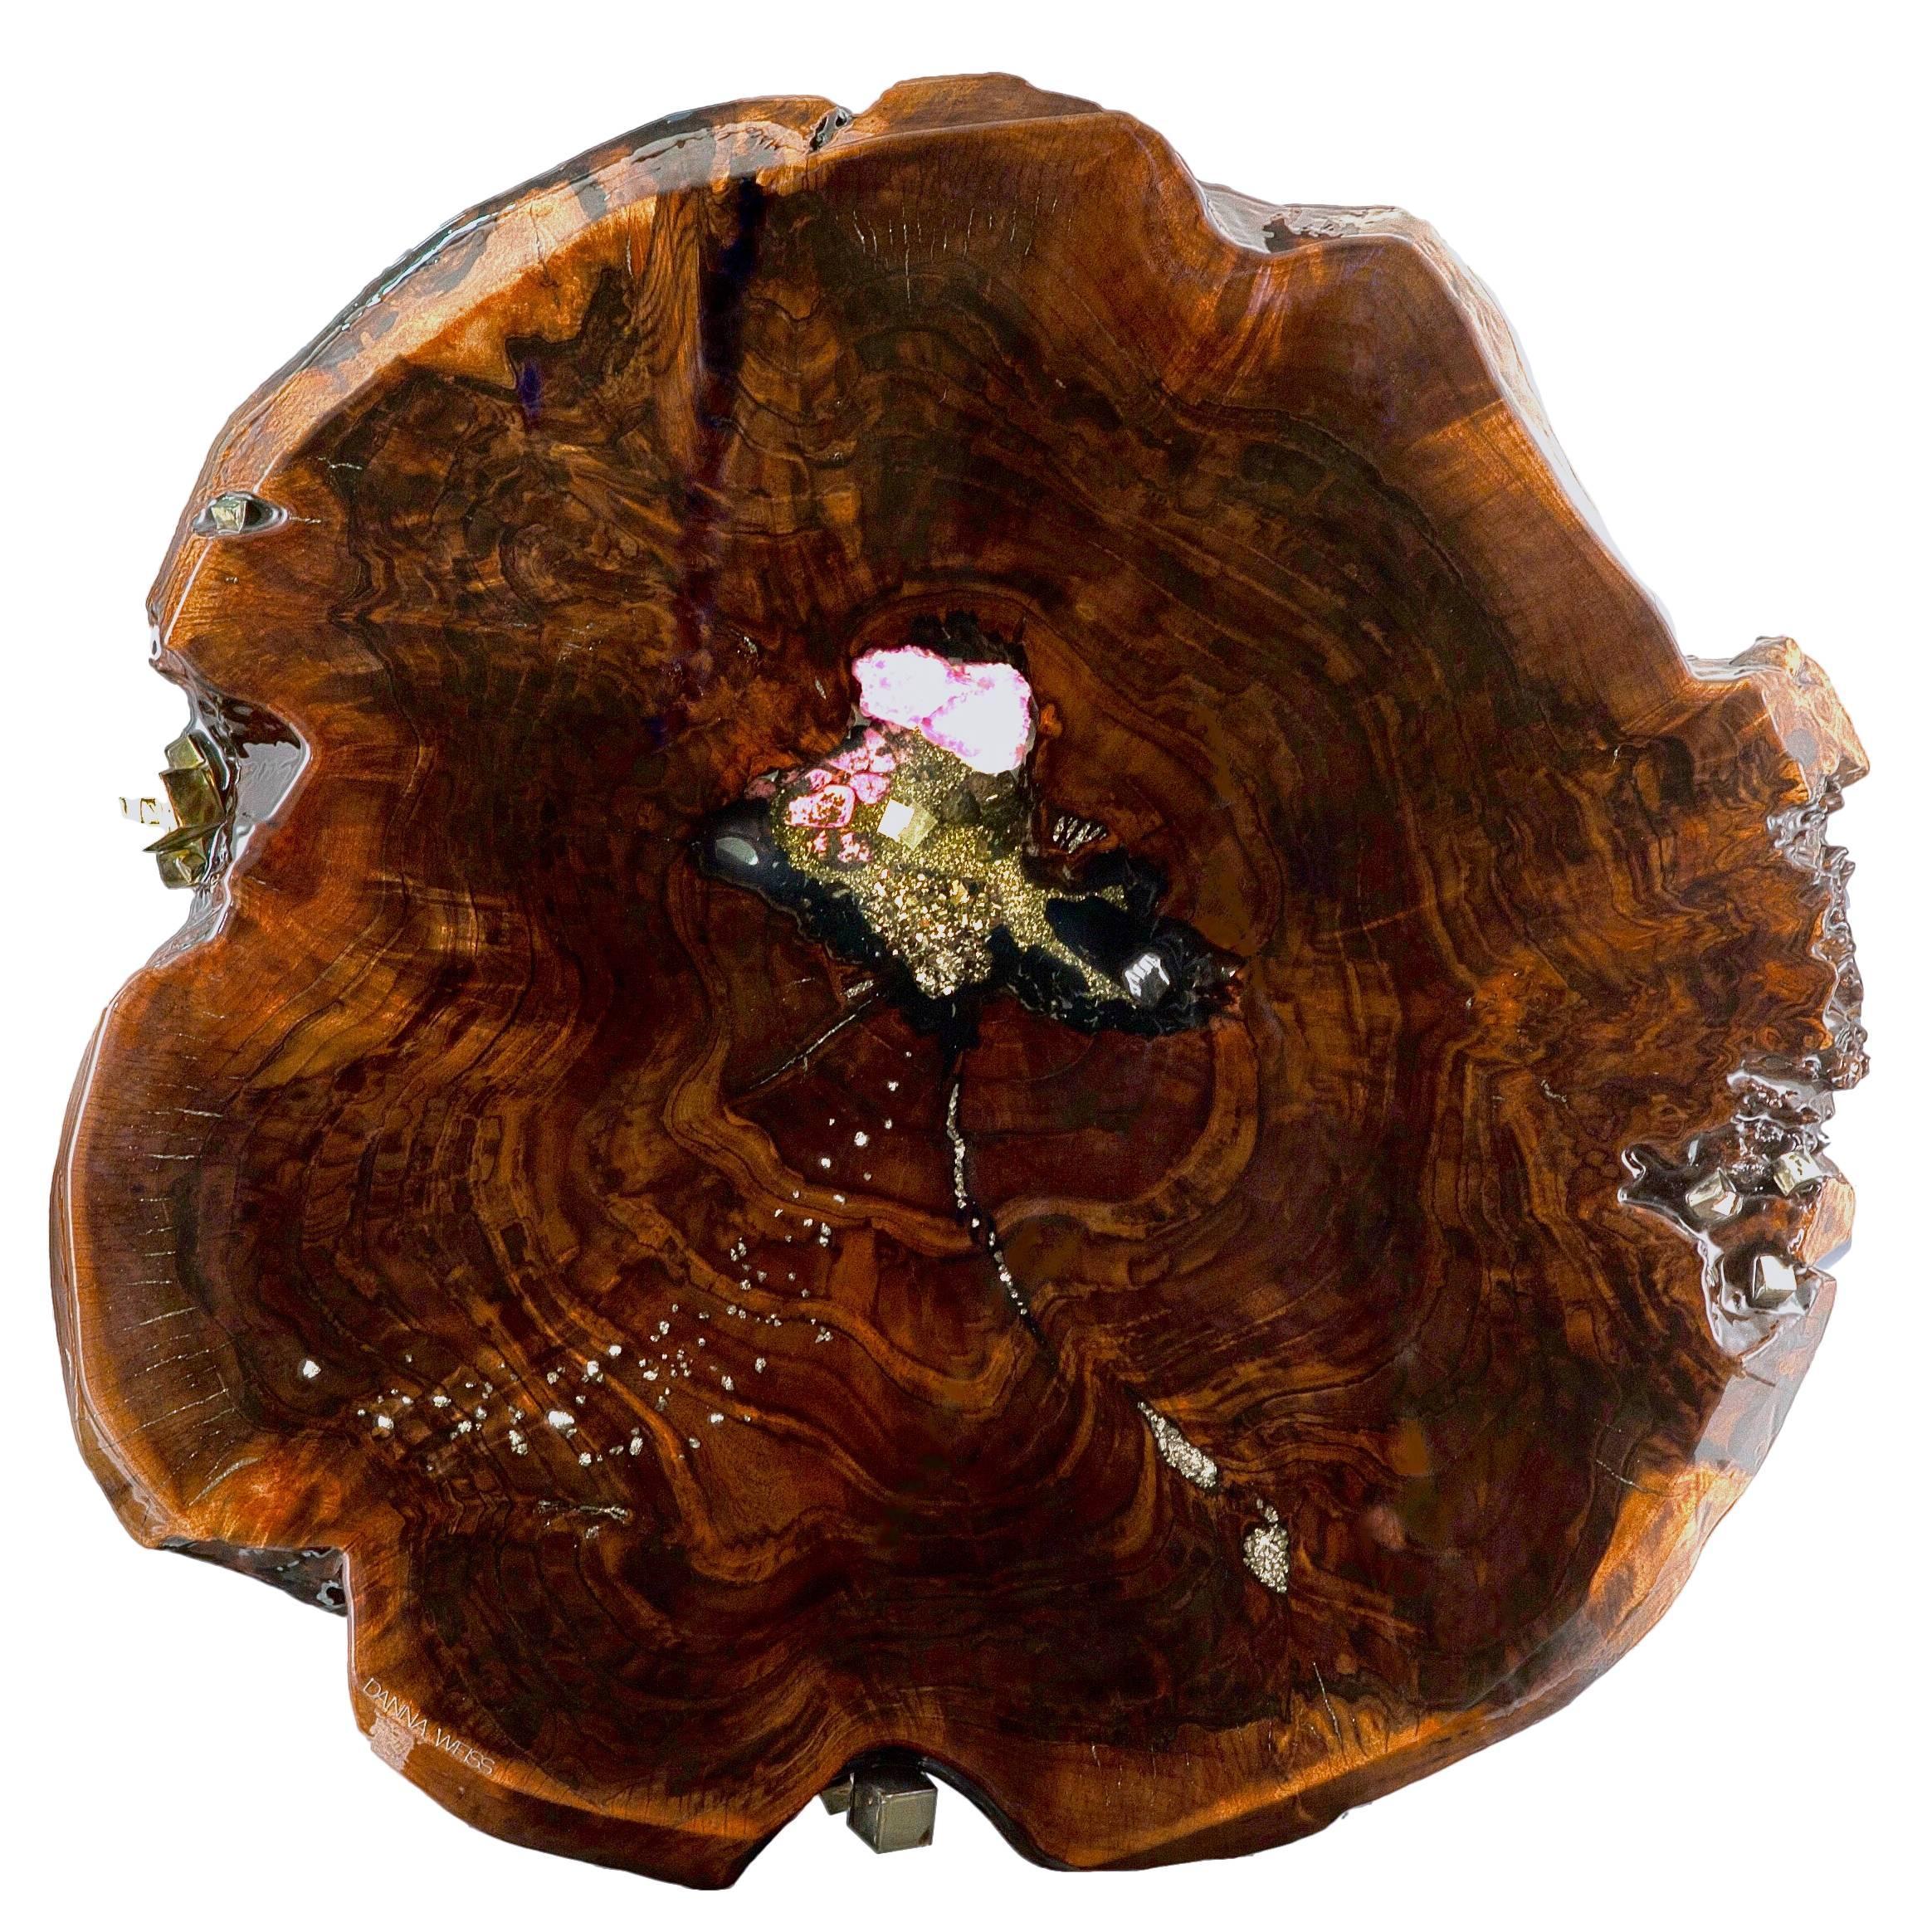 Walnut wood sculpture with gemstone inlay